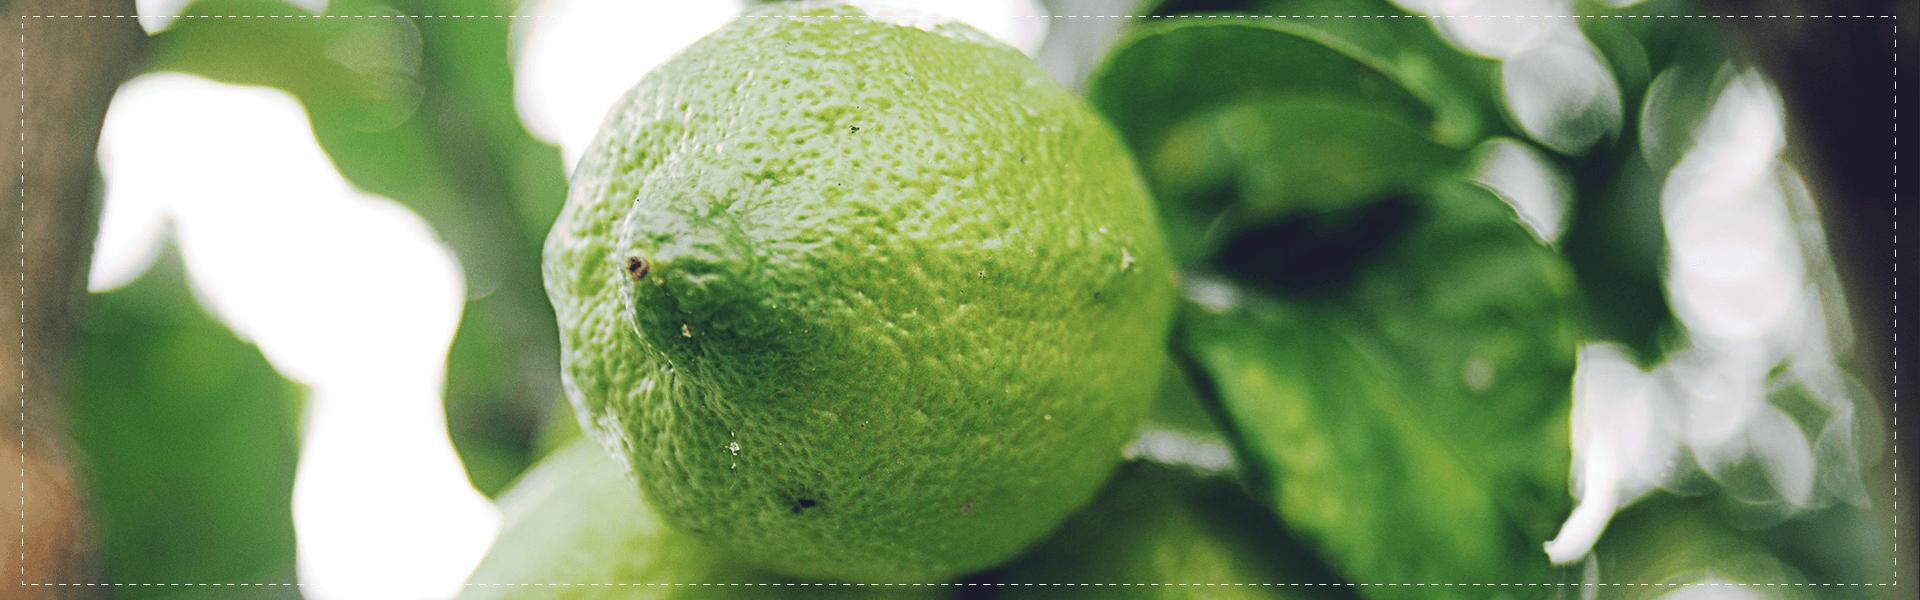 green-limoni-banner